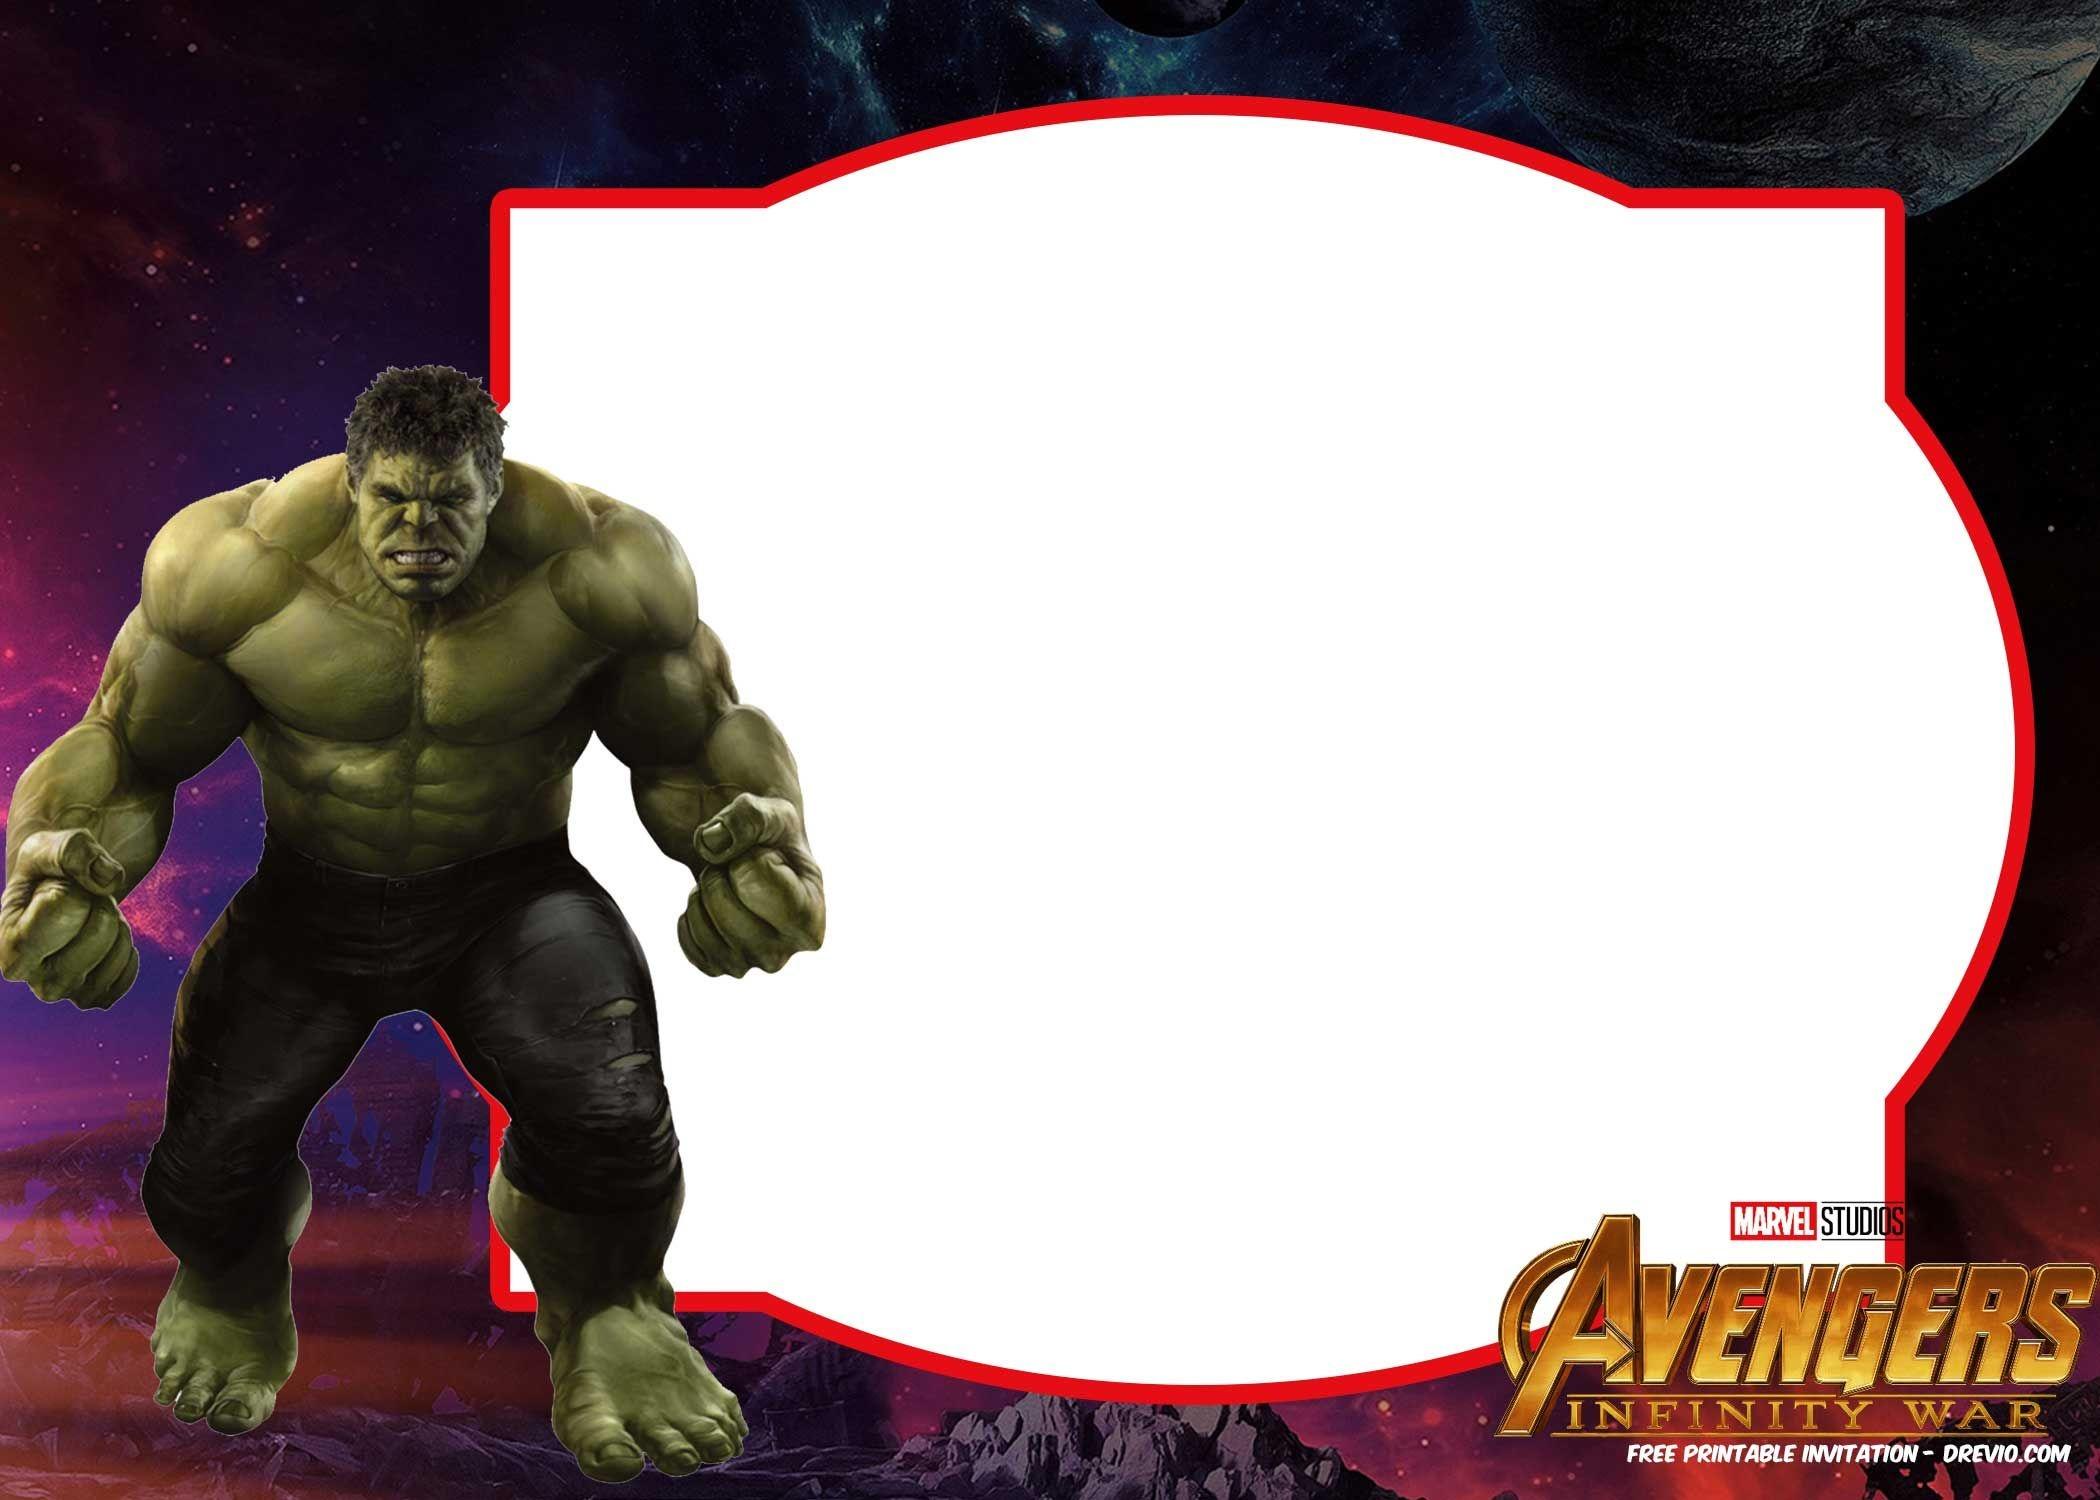 Free Avengers Infinity Wars Birthday Invitation Templates - All - Free Printable Avengers Birthday Party Invitations